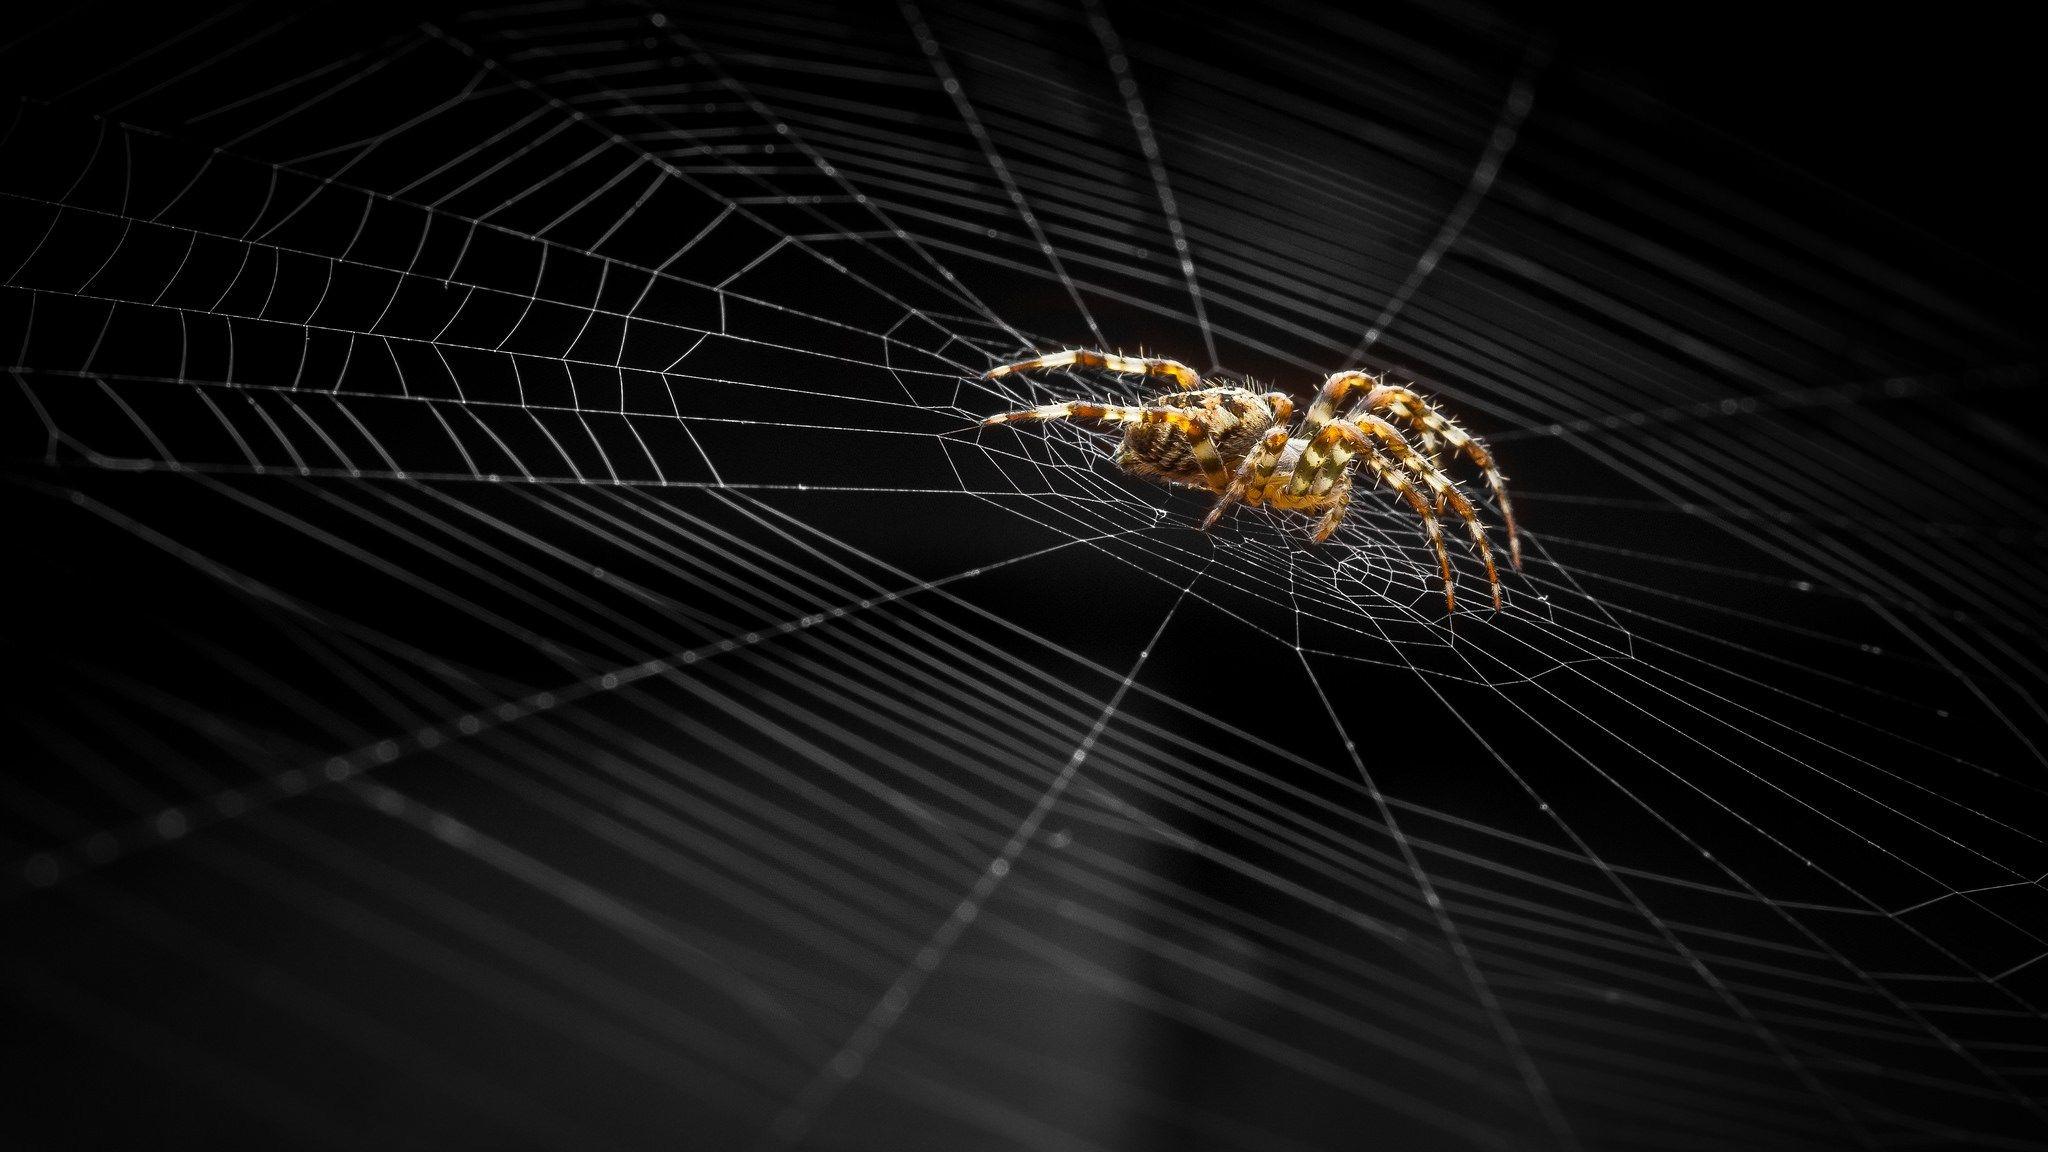 Download Wallpaper Halloween Spider - f990a74189d2571e94eb7b800f63c879  HD_55312.jpg